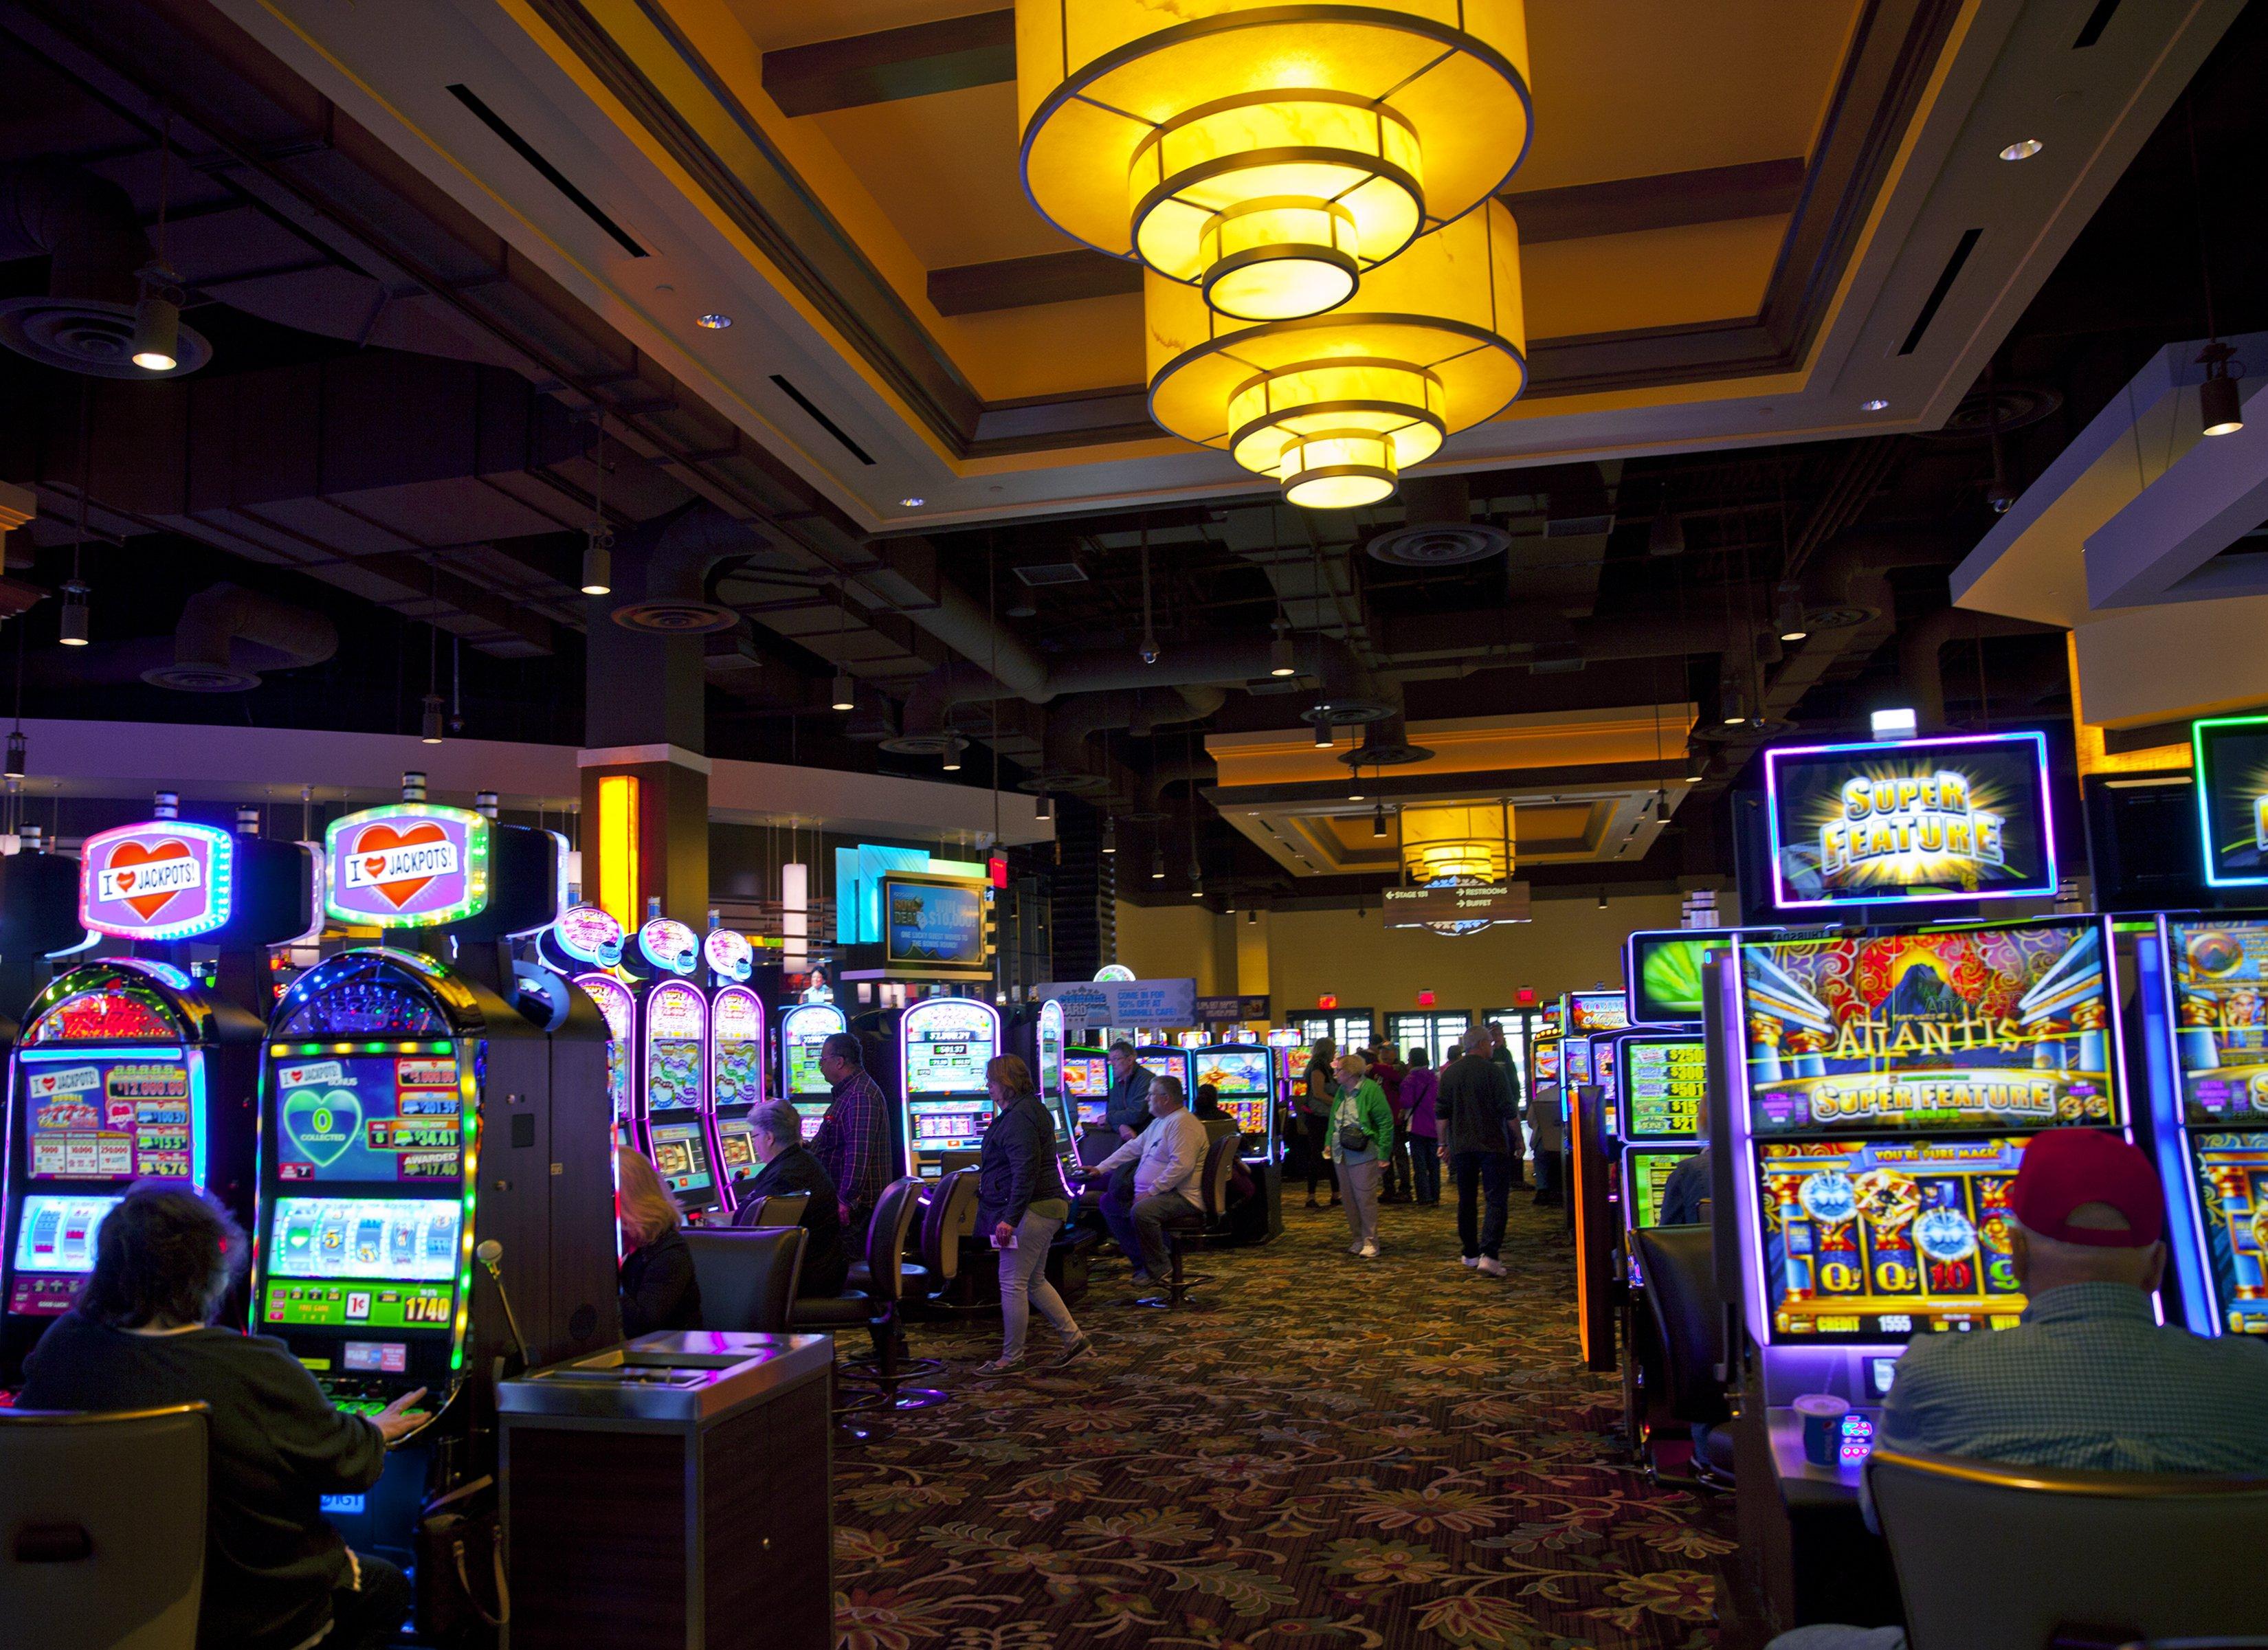 Indian casinos in northern michigan game aliens vs predator 2 download